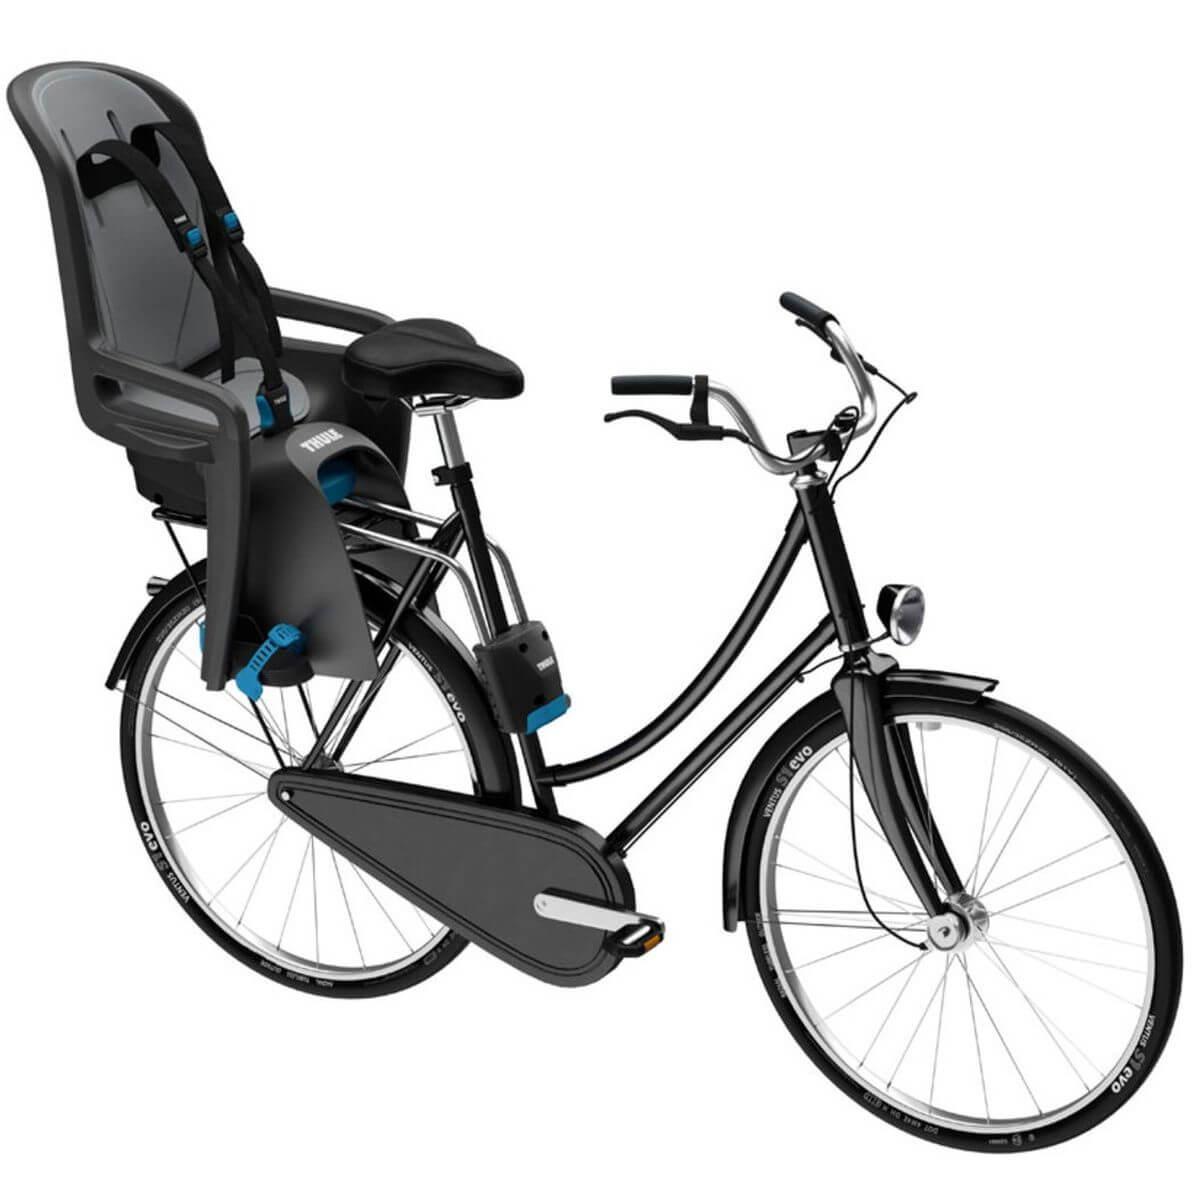 Porte-bébé vélo RIDEALONG Thule light grey